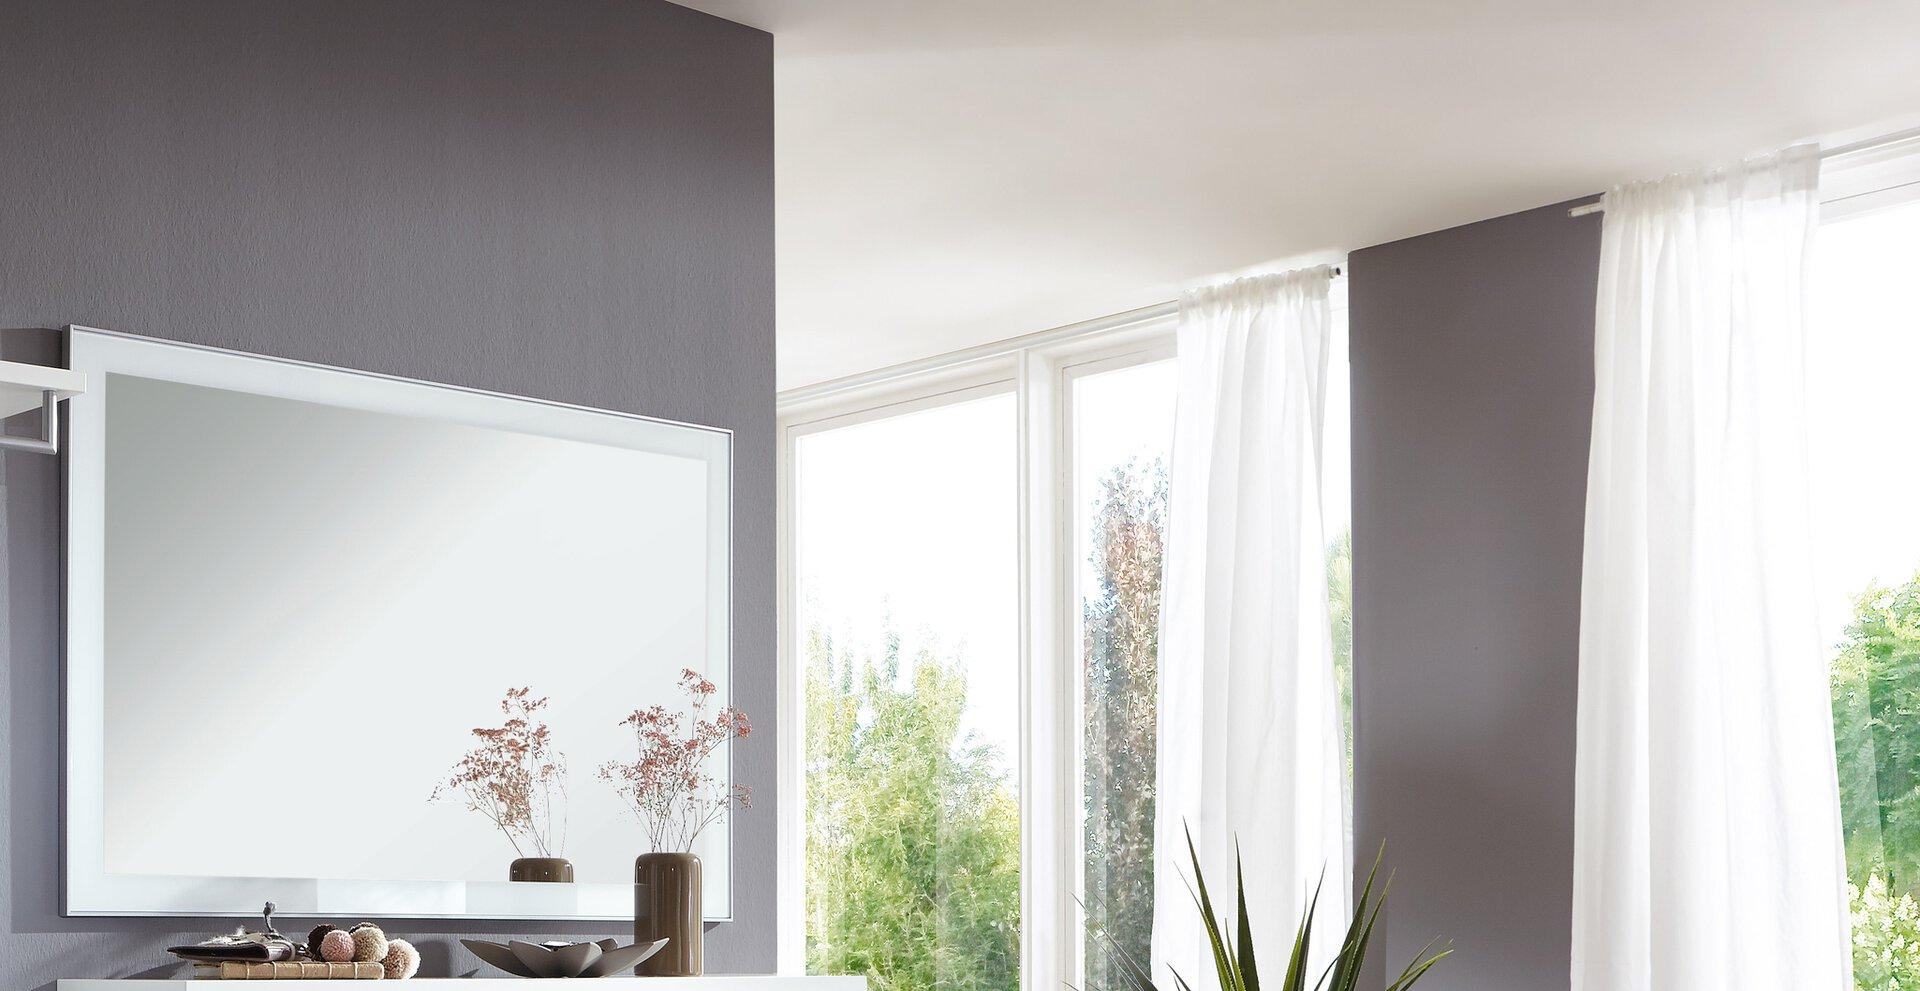 Spiegel SANTINA Voss Möbel Holzwerkstoff mehrfarbig 2 x 77 x 120 cm